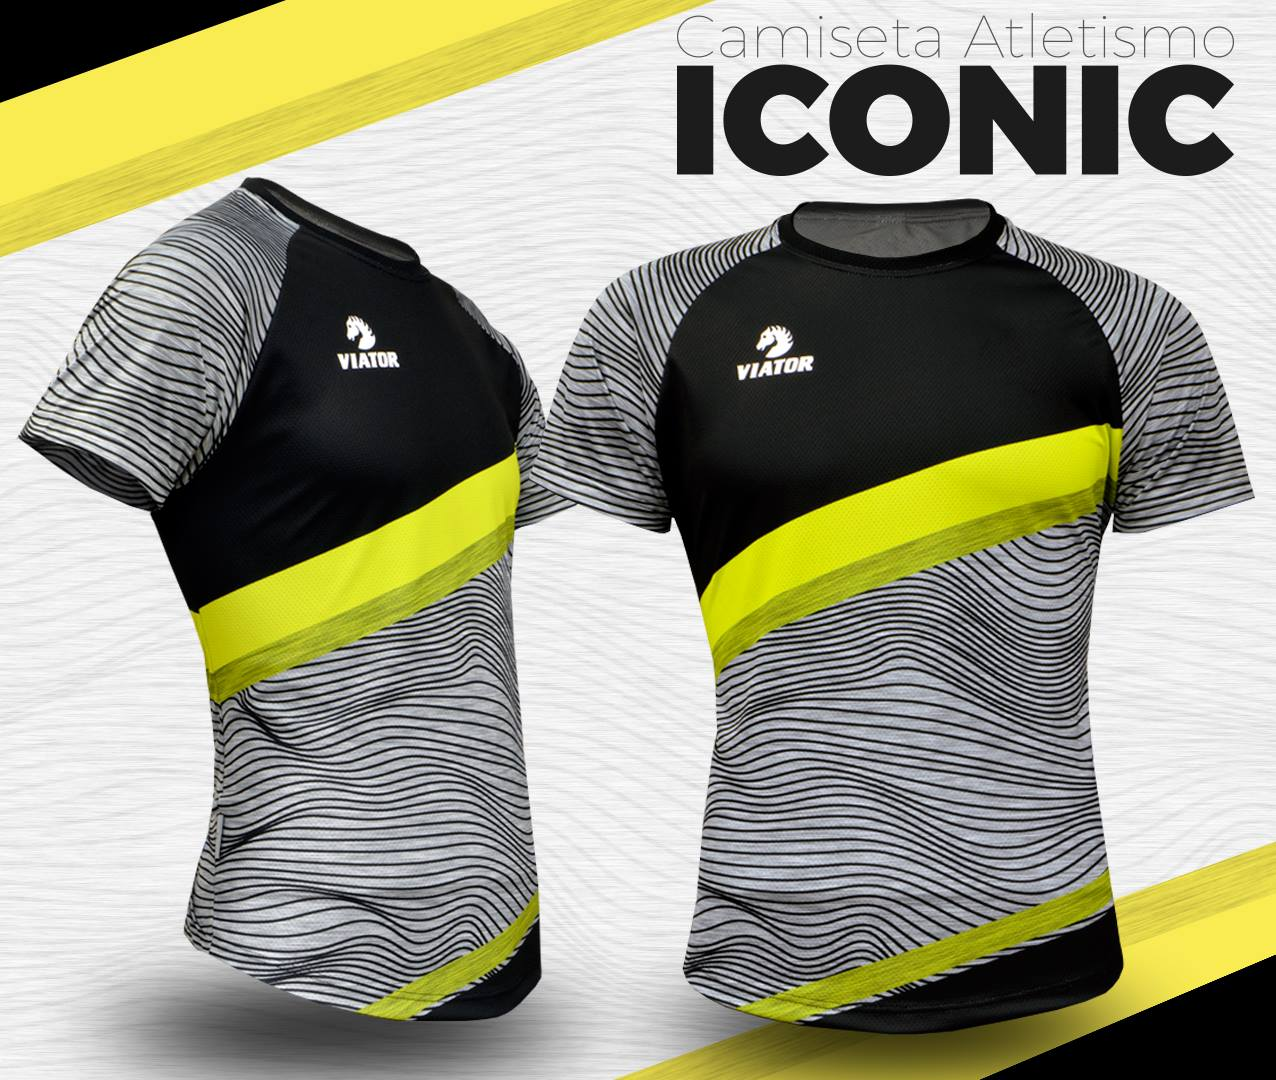 Camiseta de atletismo Viator Iconic